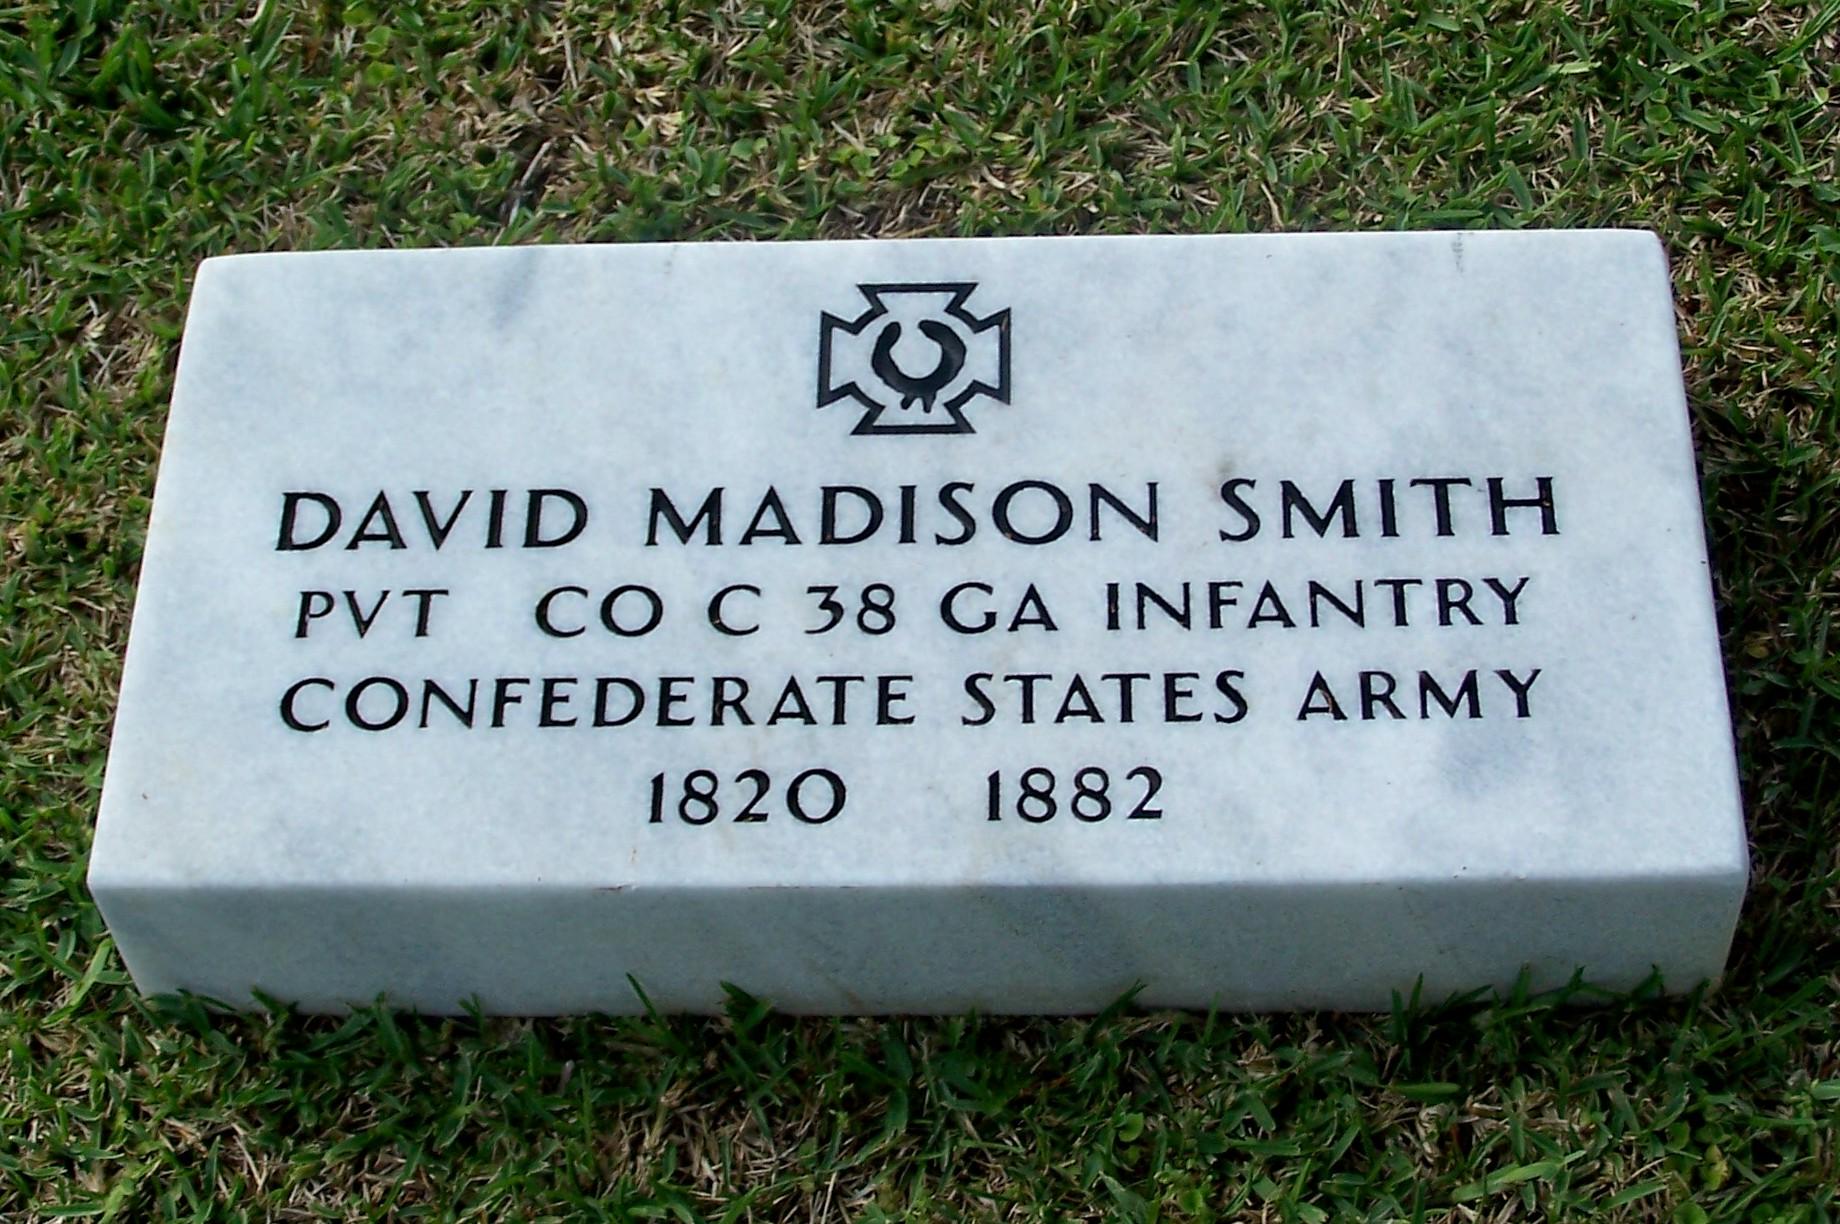 David Madison Smith